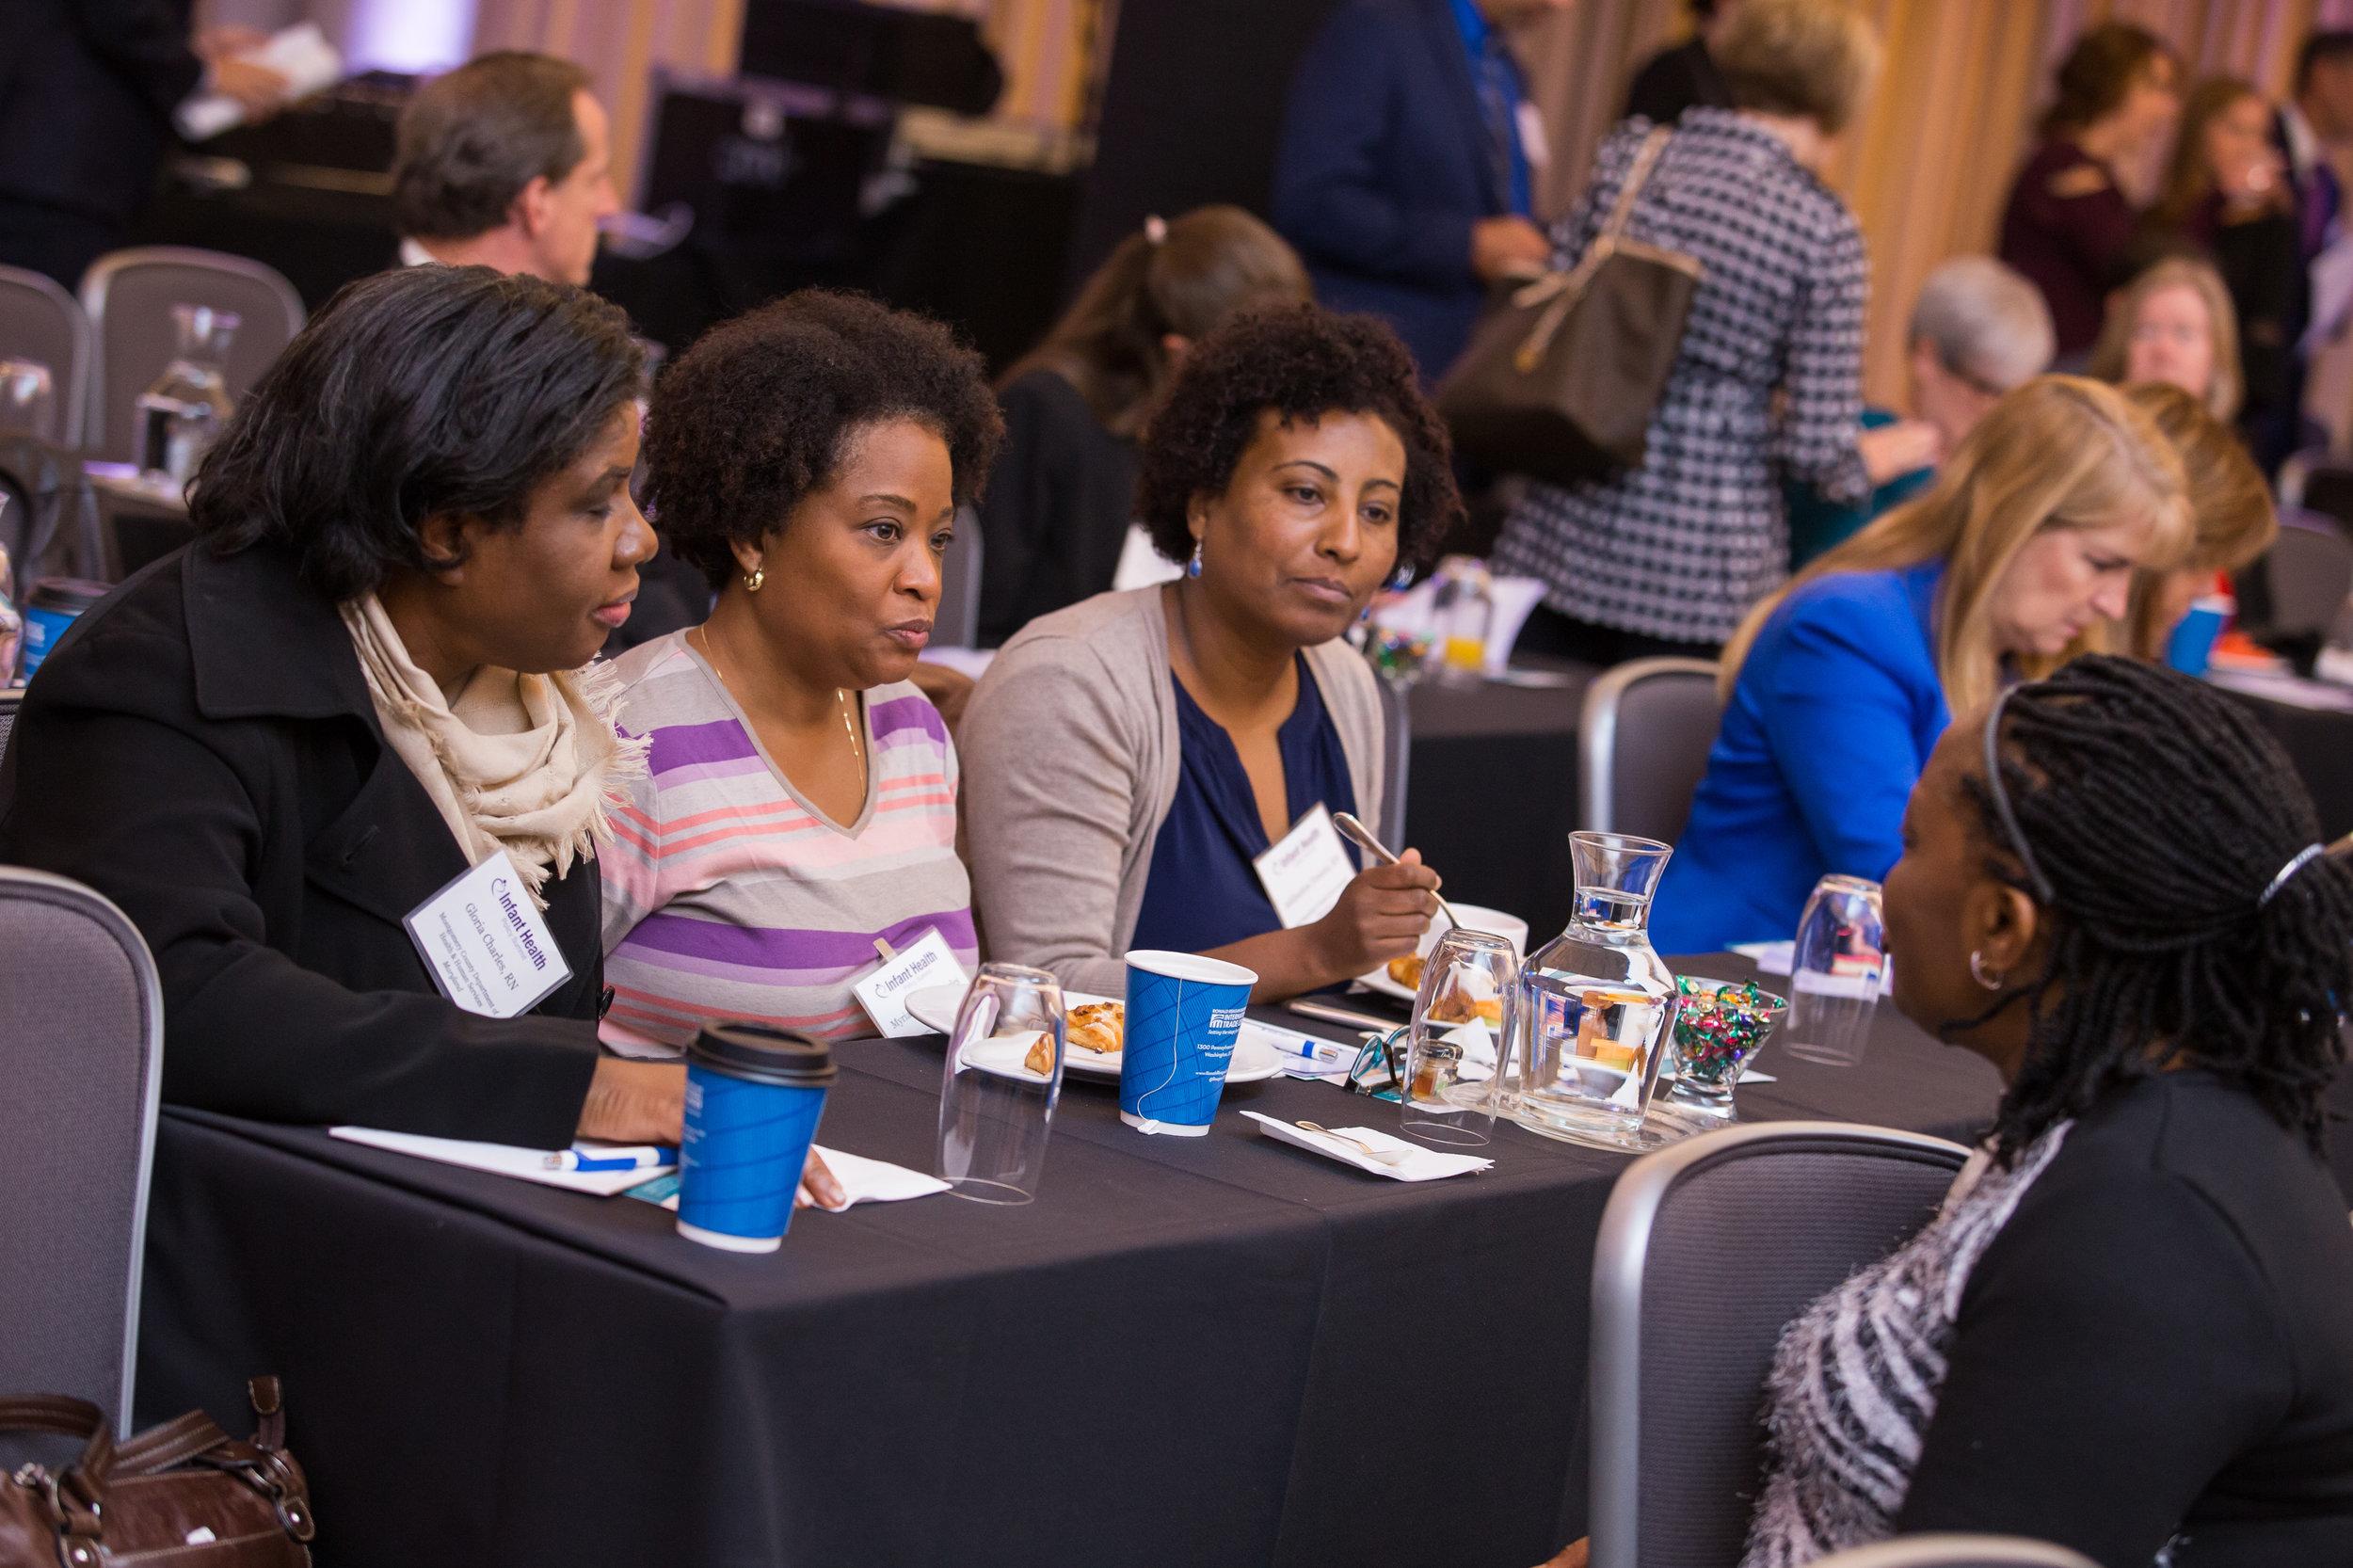 Infant Health Policy Summit - Jason Dixson Photography - 090353 - 1027.jpg